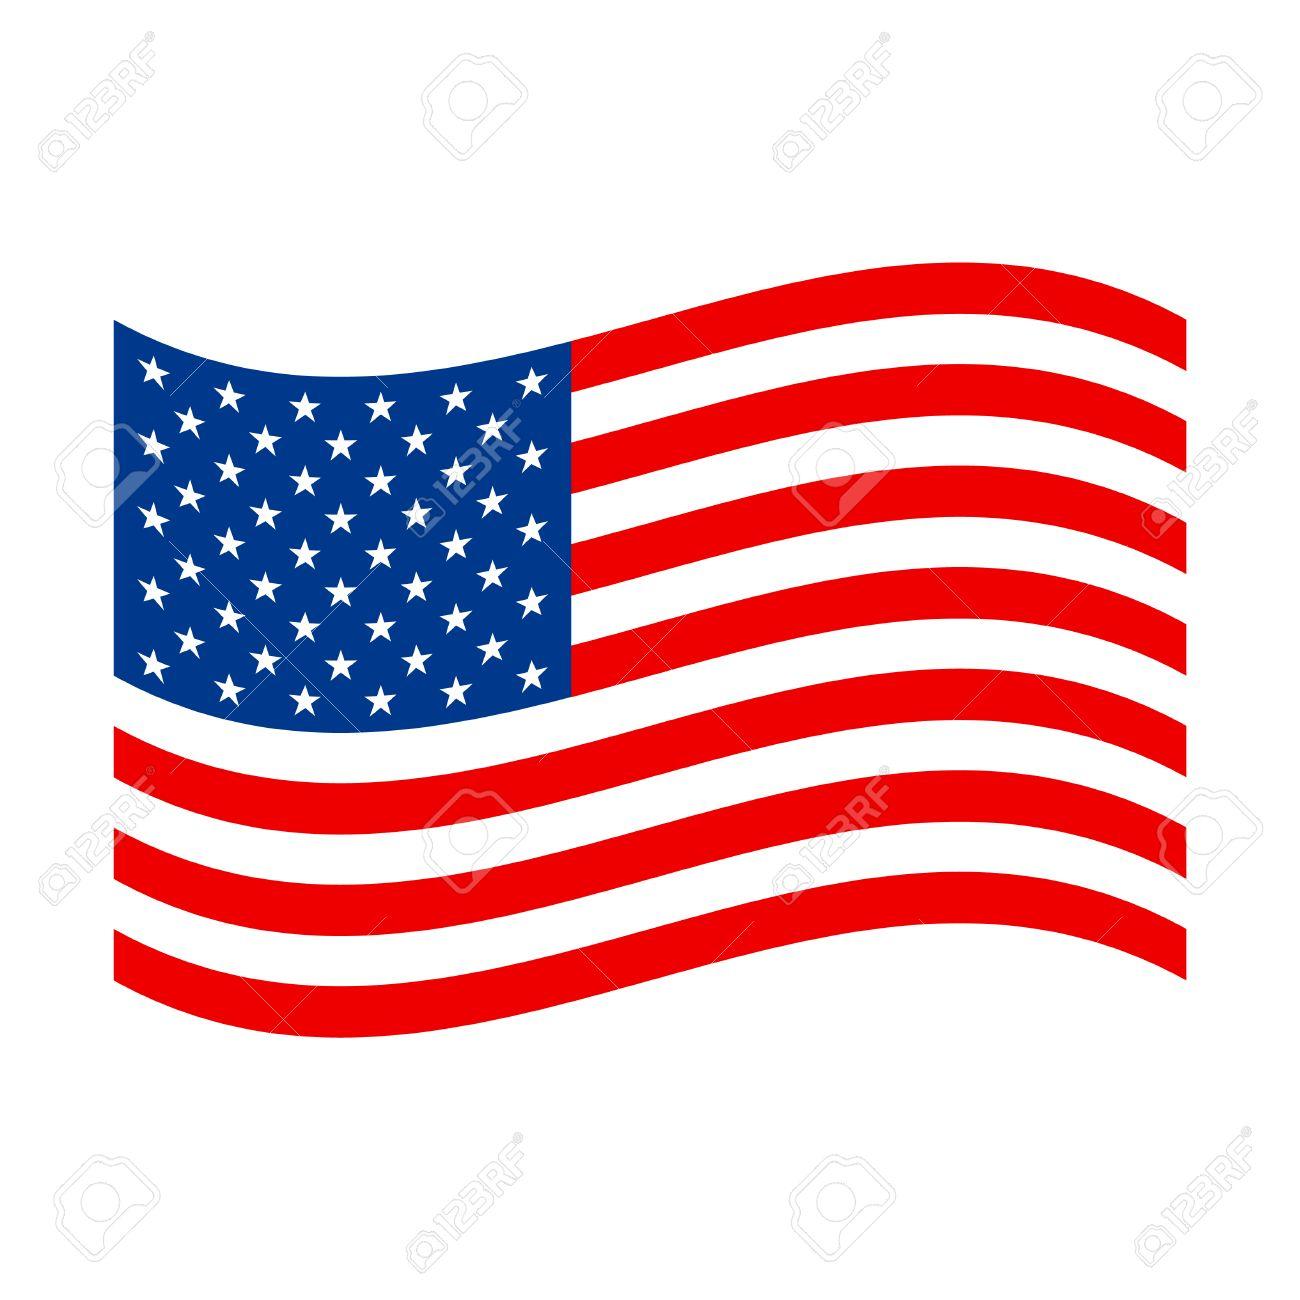 american flag vector icon royalty free cliparts vectors and stock rh 123rf com us flag vector clipart us flag vector heart